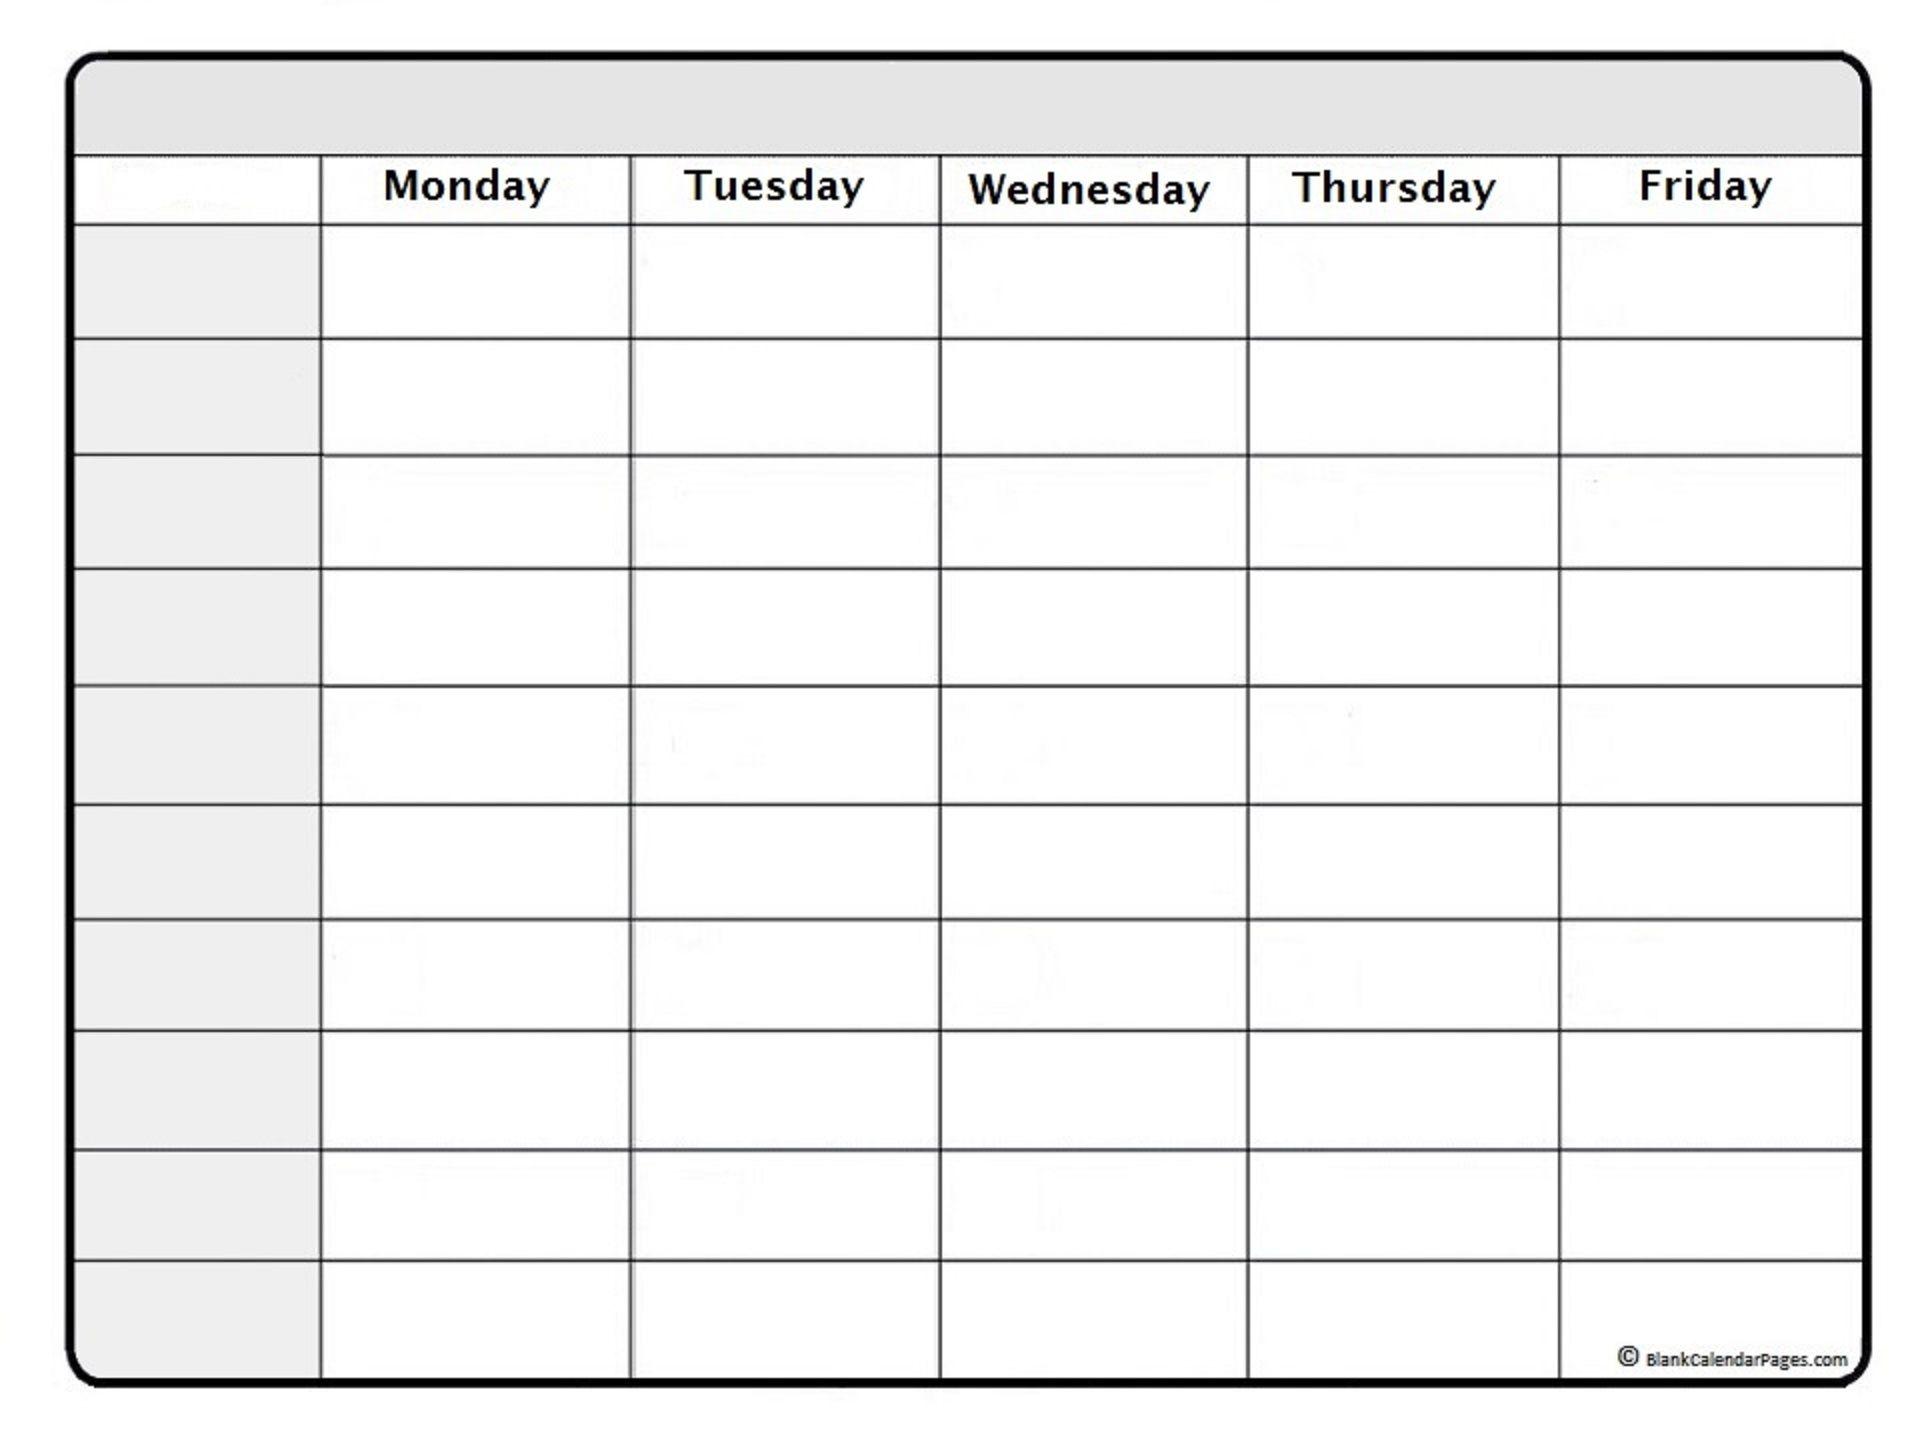 June 2020 Weekly Calendar | June 2020 Weekly Calendar Template